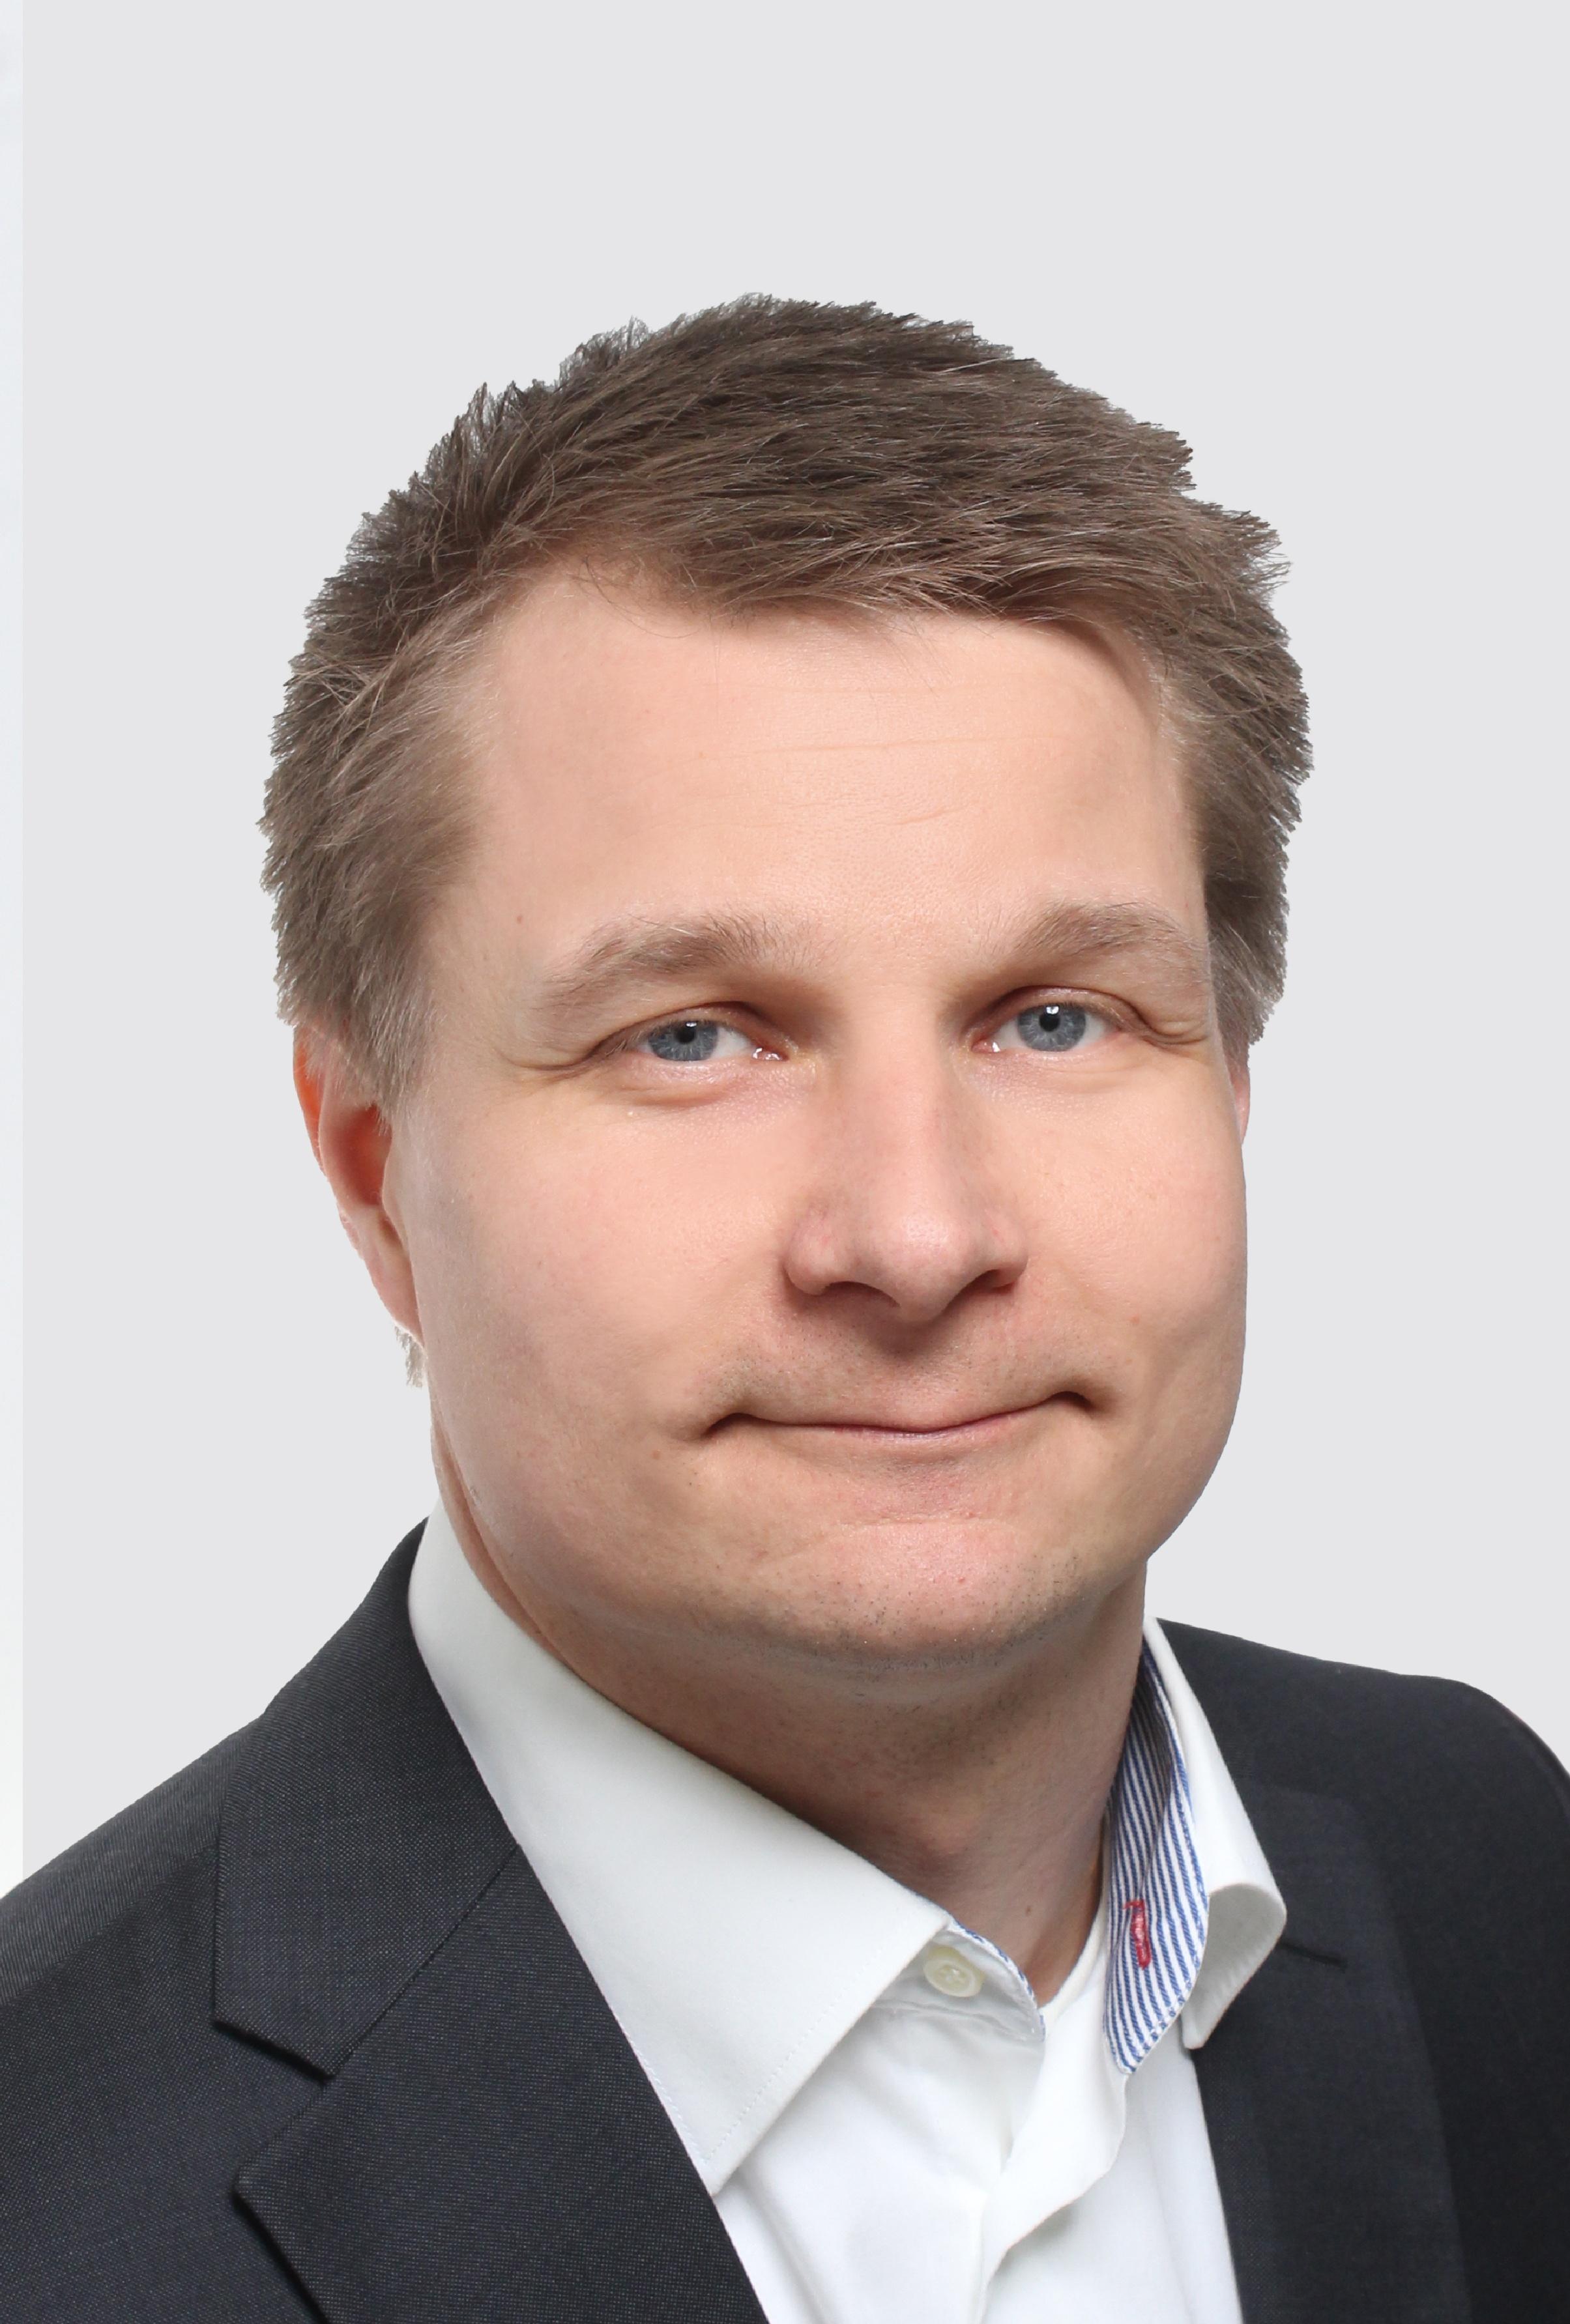 Kalle Roselli - Manager, Sales & Product Management, EFLA Oy